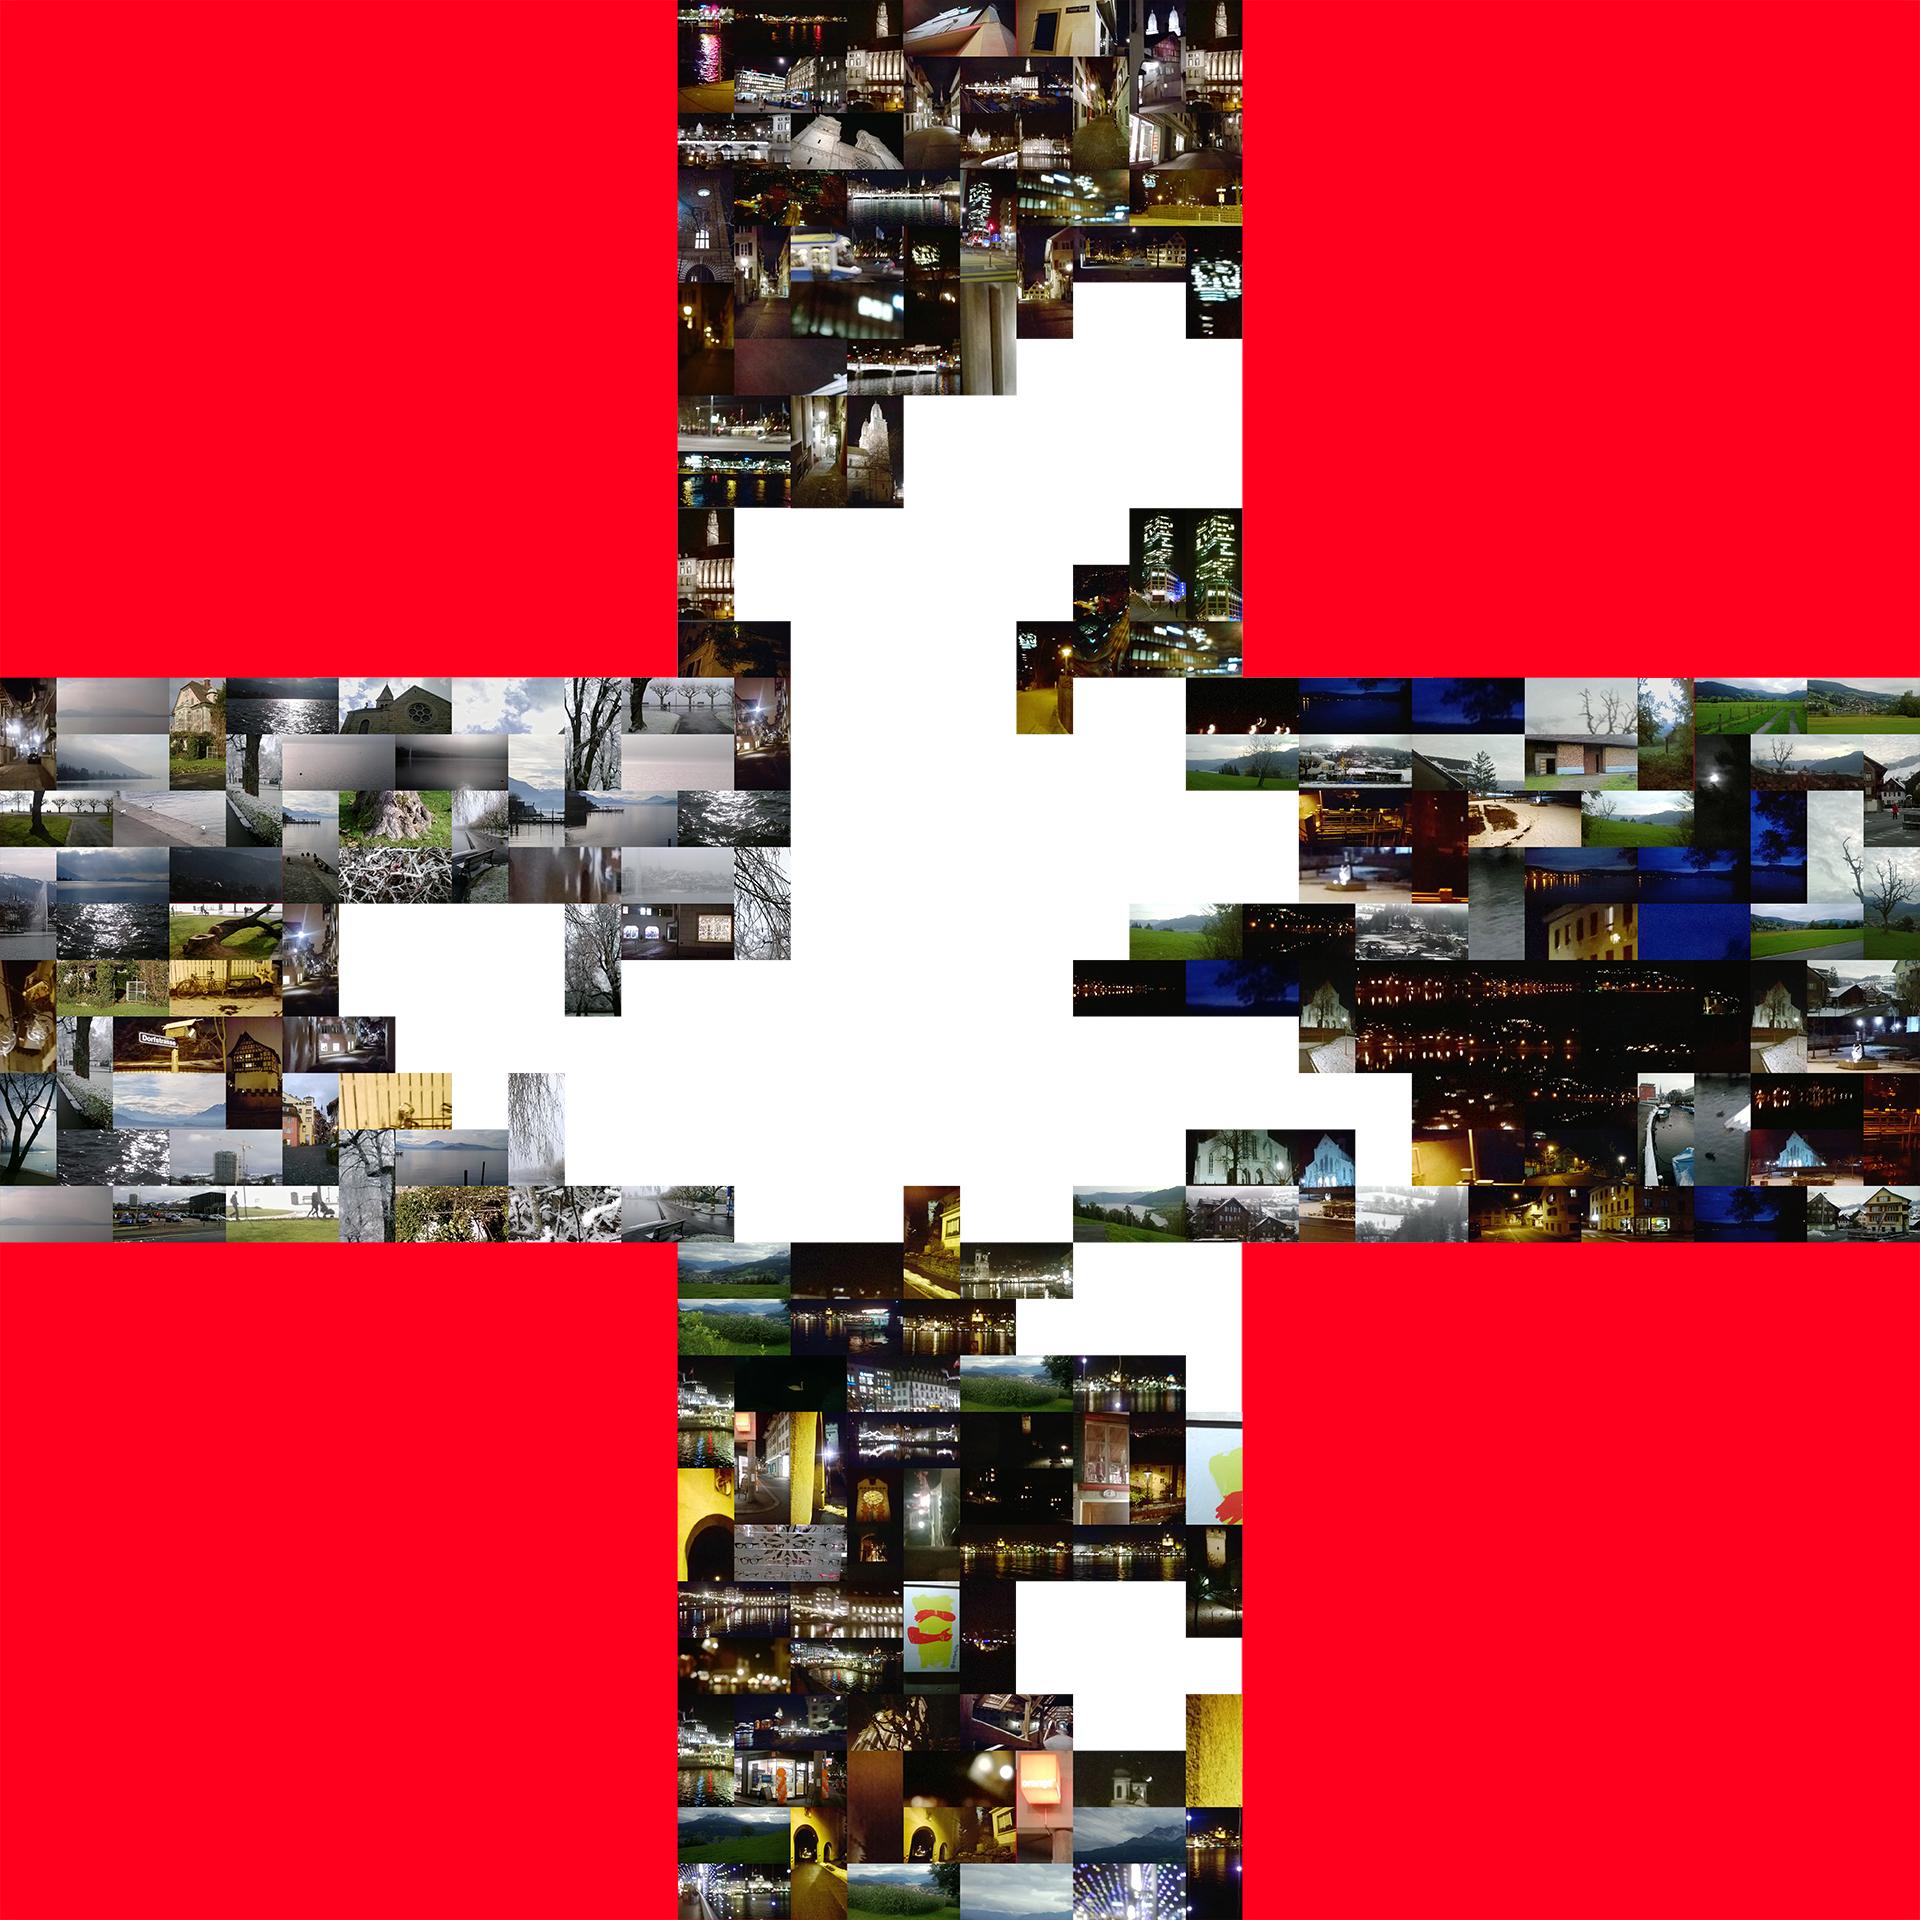 (c) Markus Hilbig Schweiz LKW Plane 2x2m